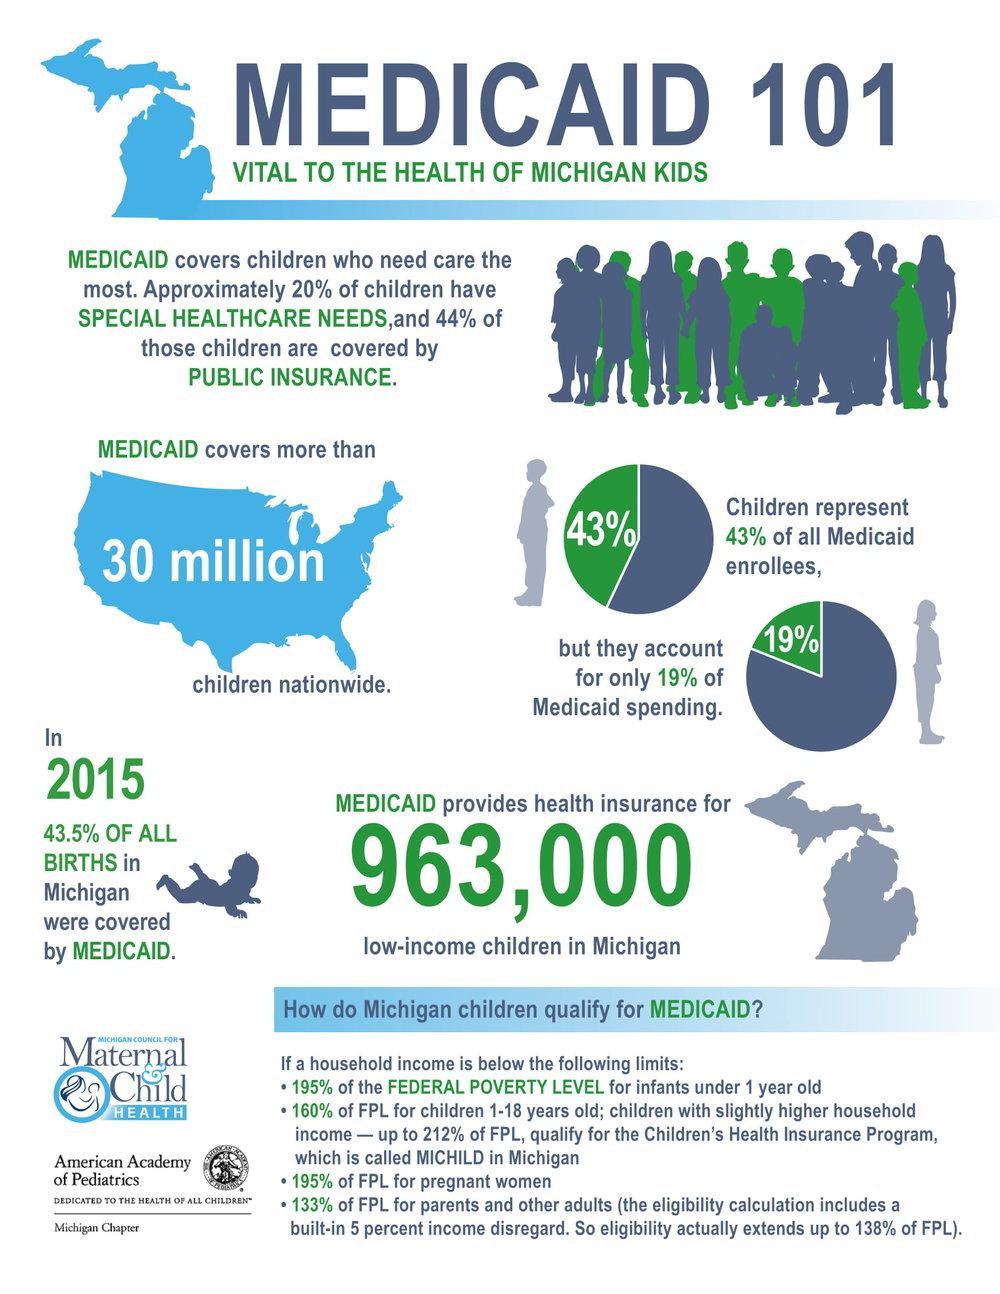 MCMCH Medicaid 101 Brief-1.jpg